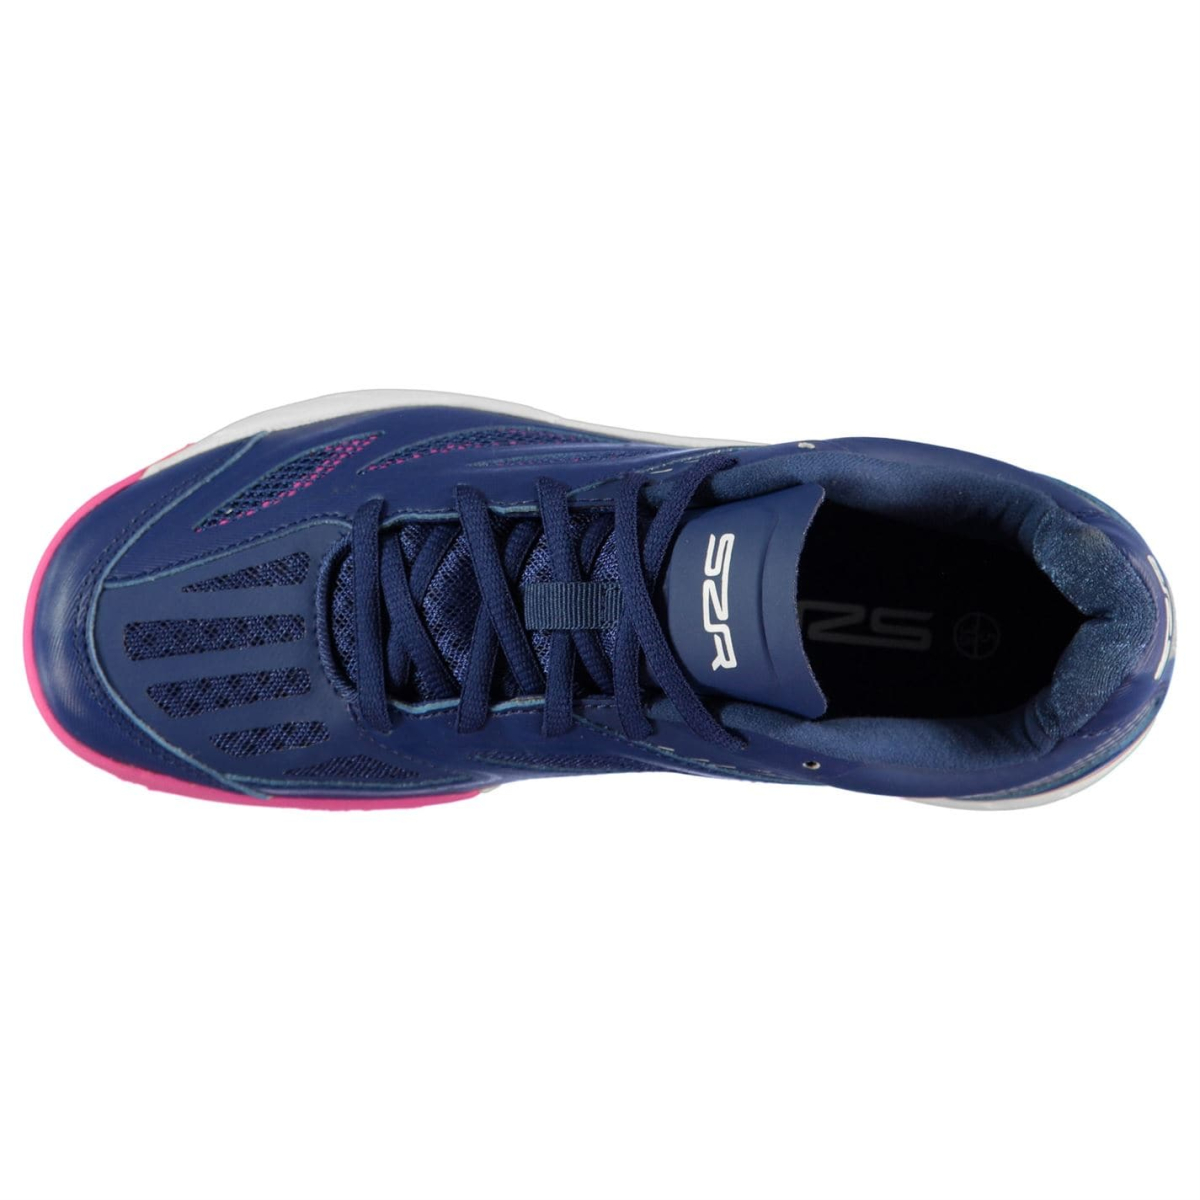 Slazenger-Turnschuhe-Damen-Sneaker-Sportschuhe-Laufschuhe-Velocity-7035 Indexbild 4